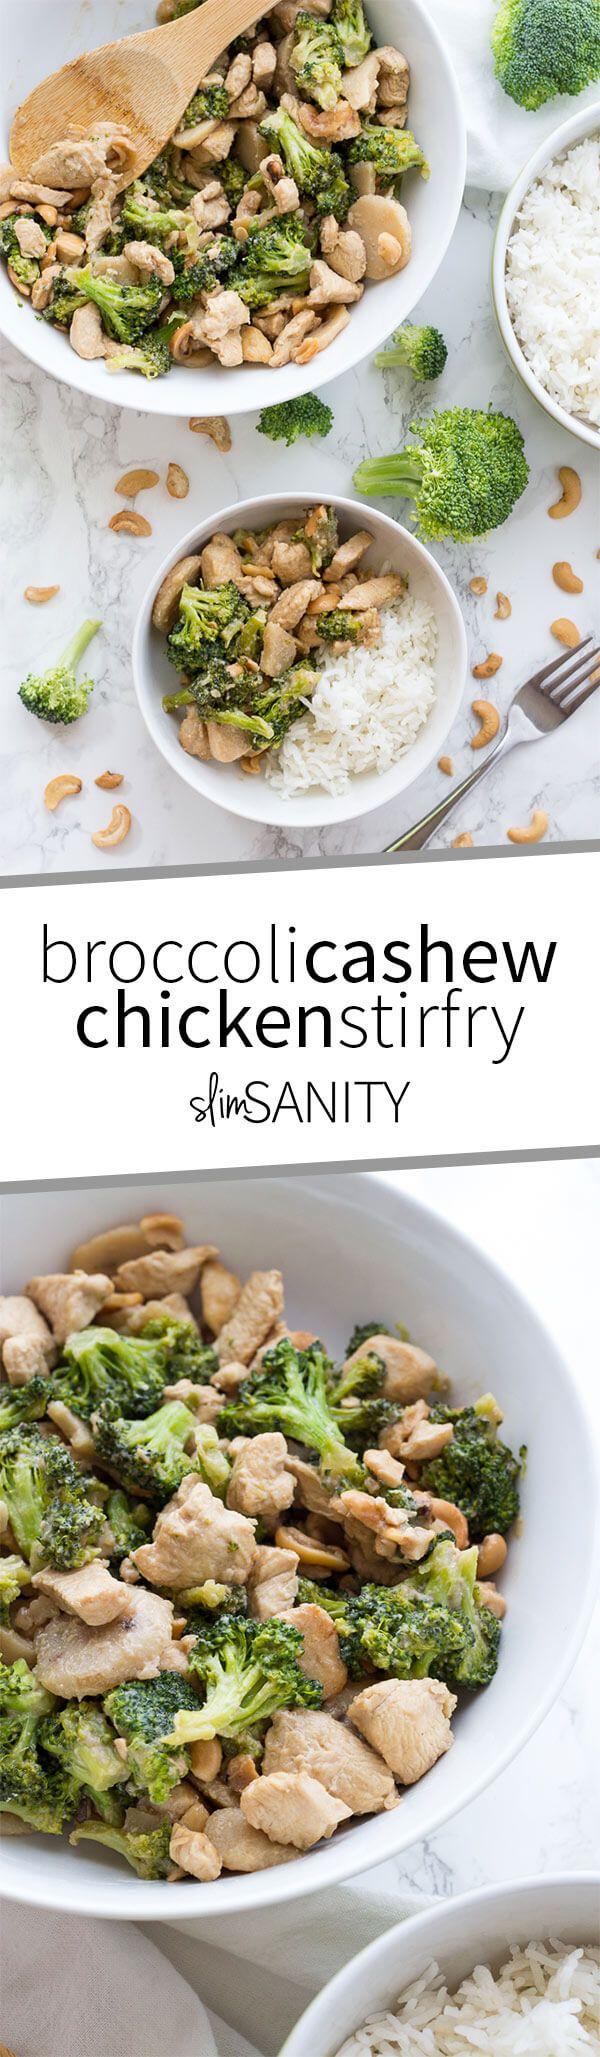 Broccoli Cashew Chicken Stir Fry  Recipe  Clean Eating -2675